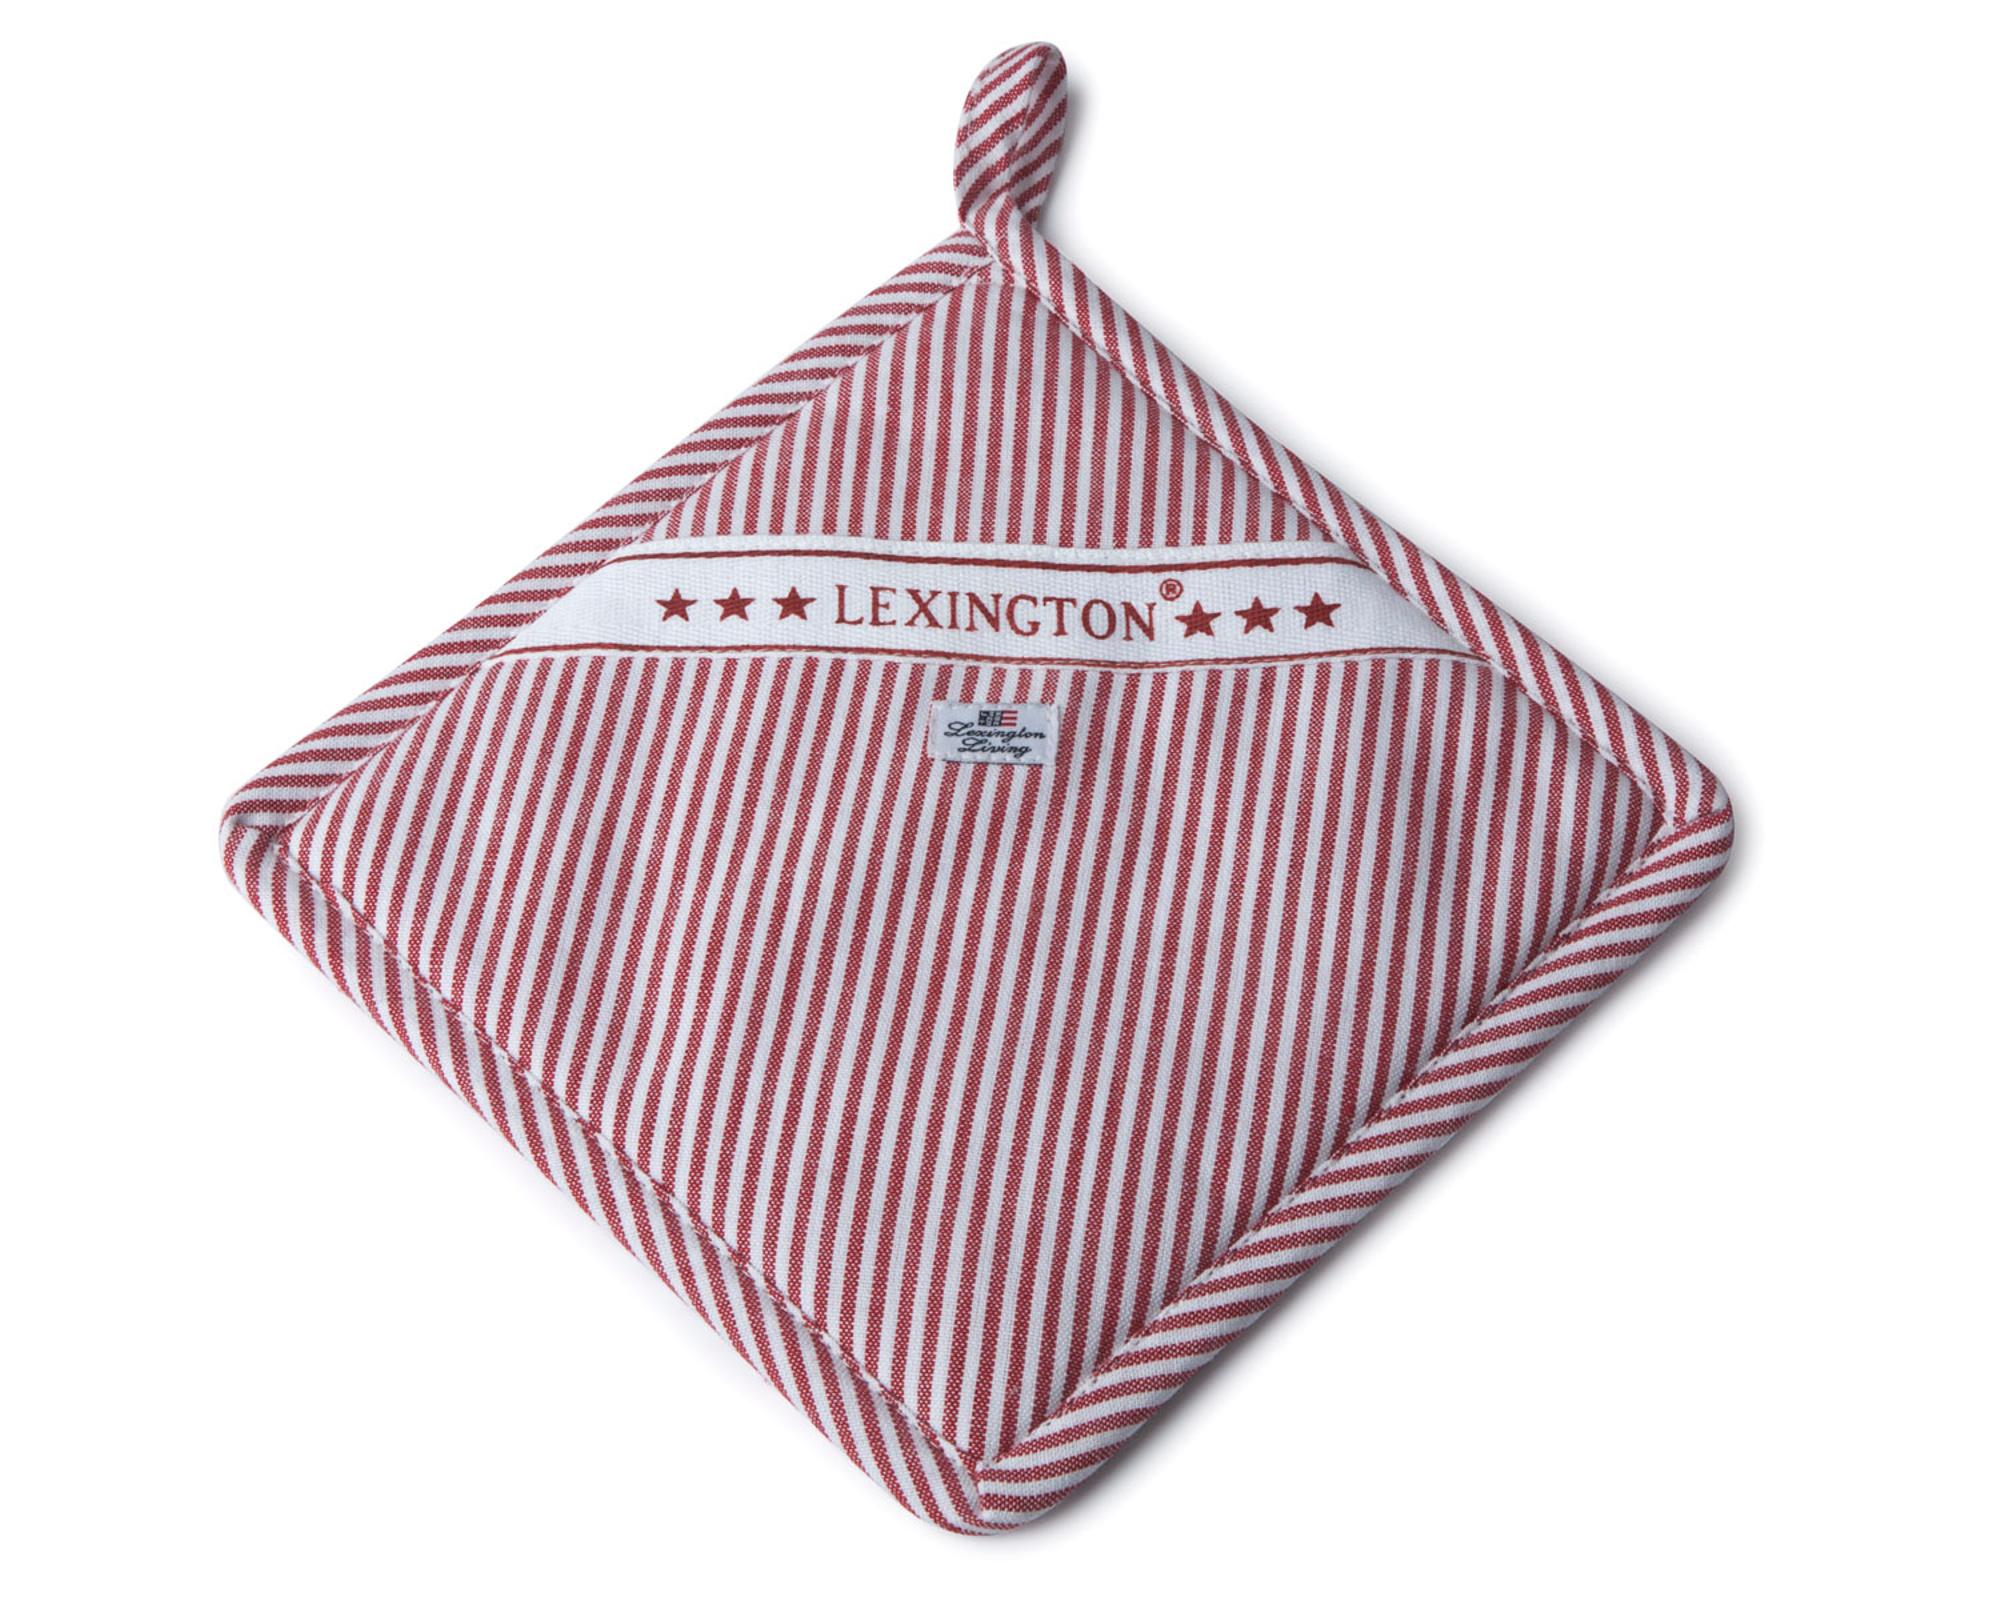 Oxford Striped Potholder